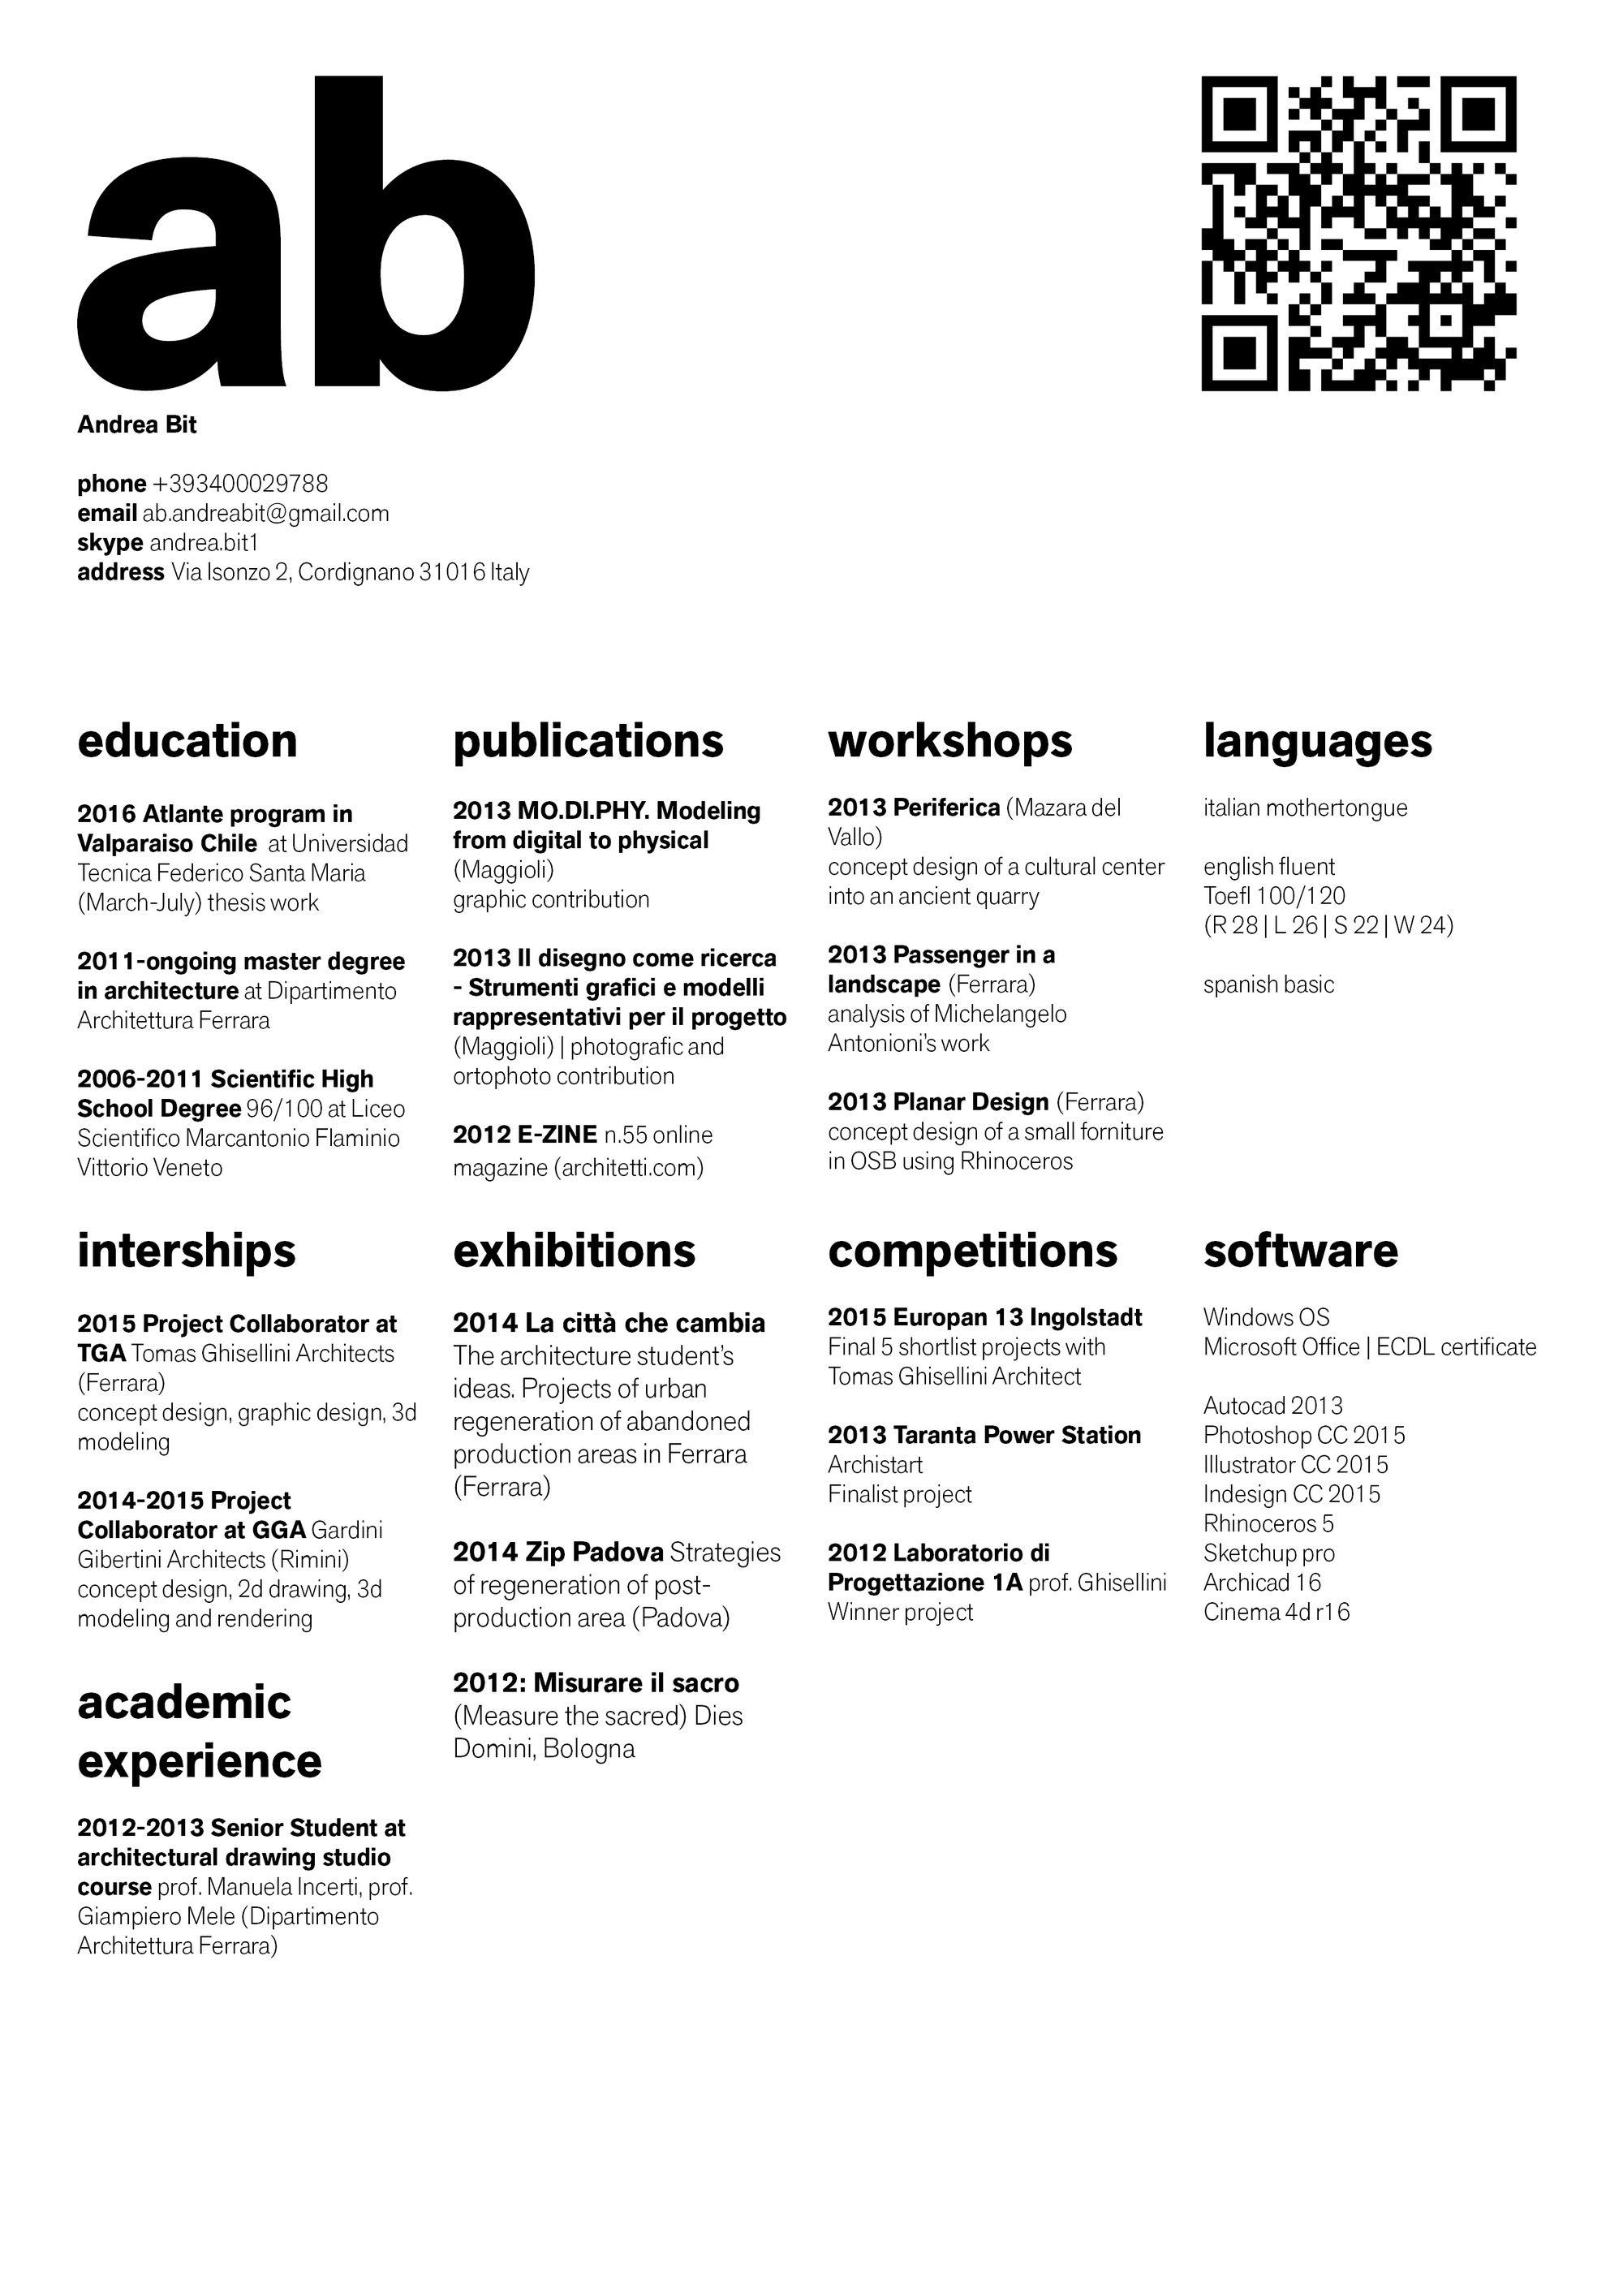 Gallery of The Top Architecture Résumé/CV Designs - 2 | Resume cv